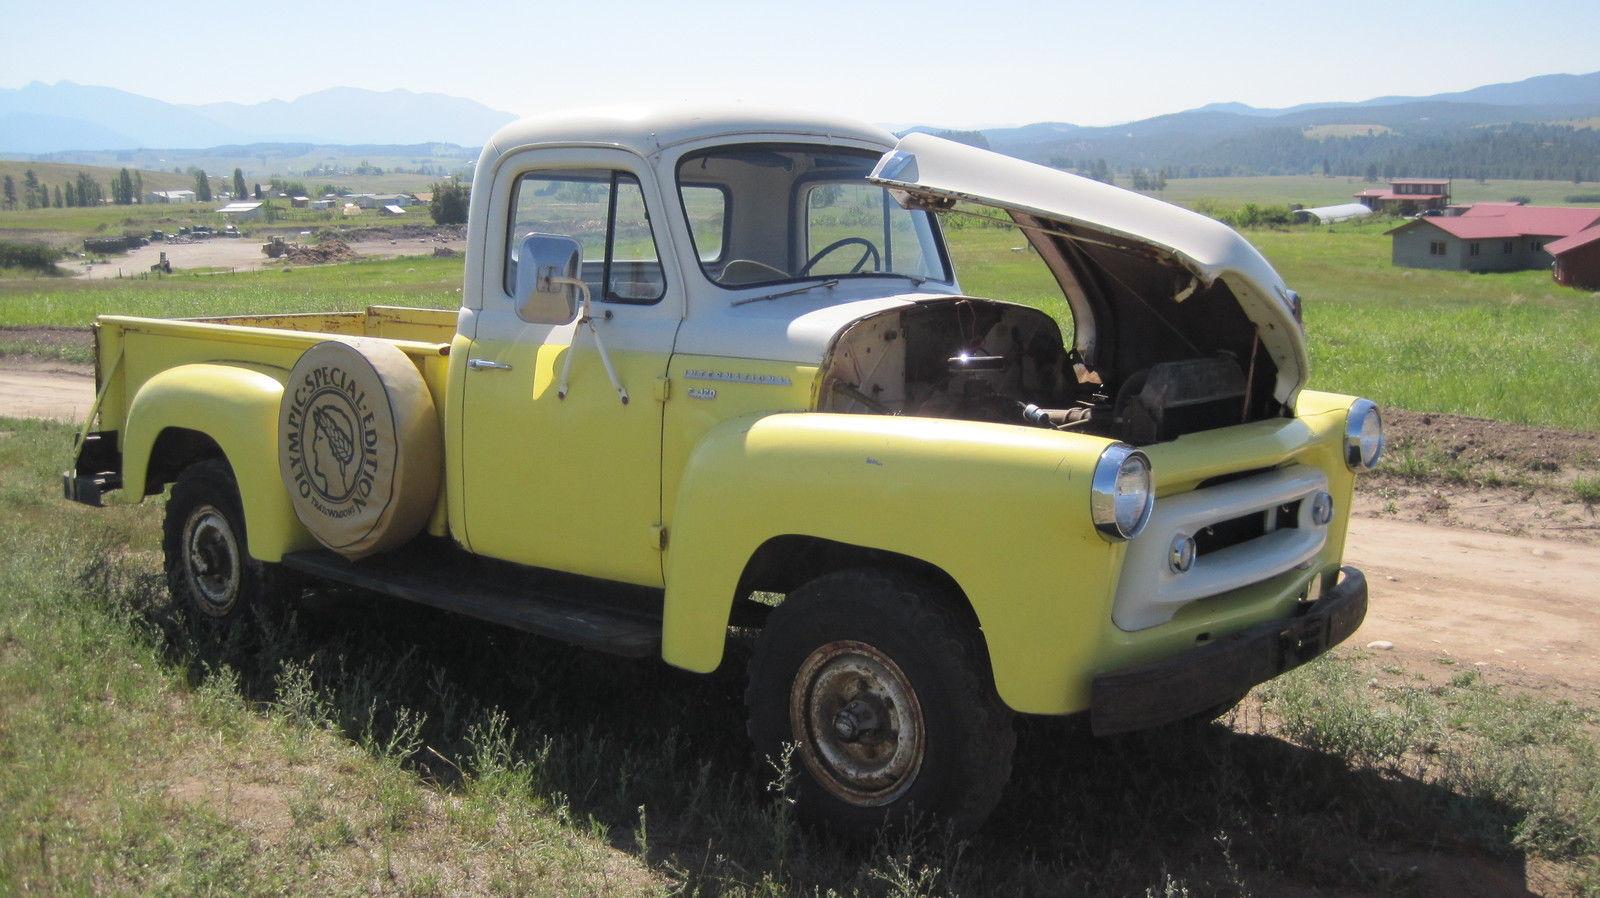 1957 International S-120 4X4 pickup - Classic International